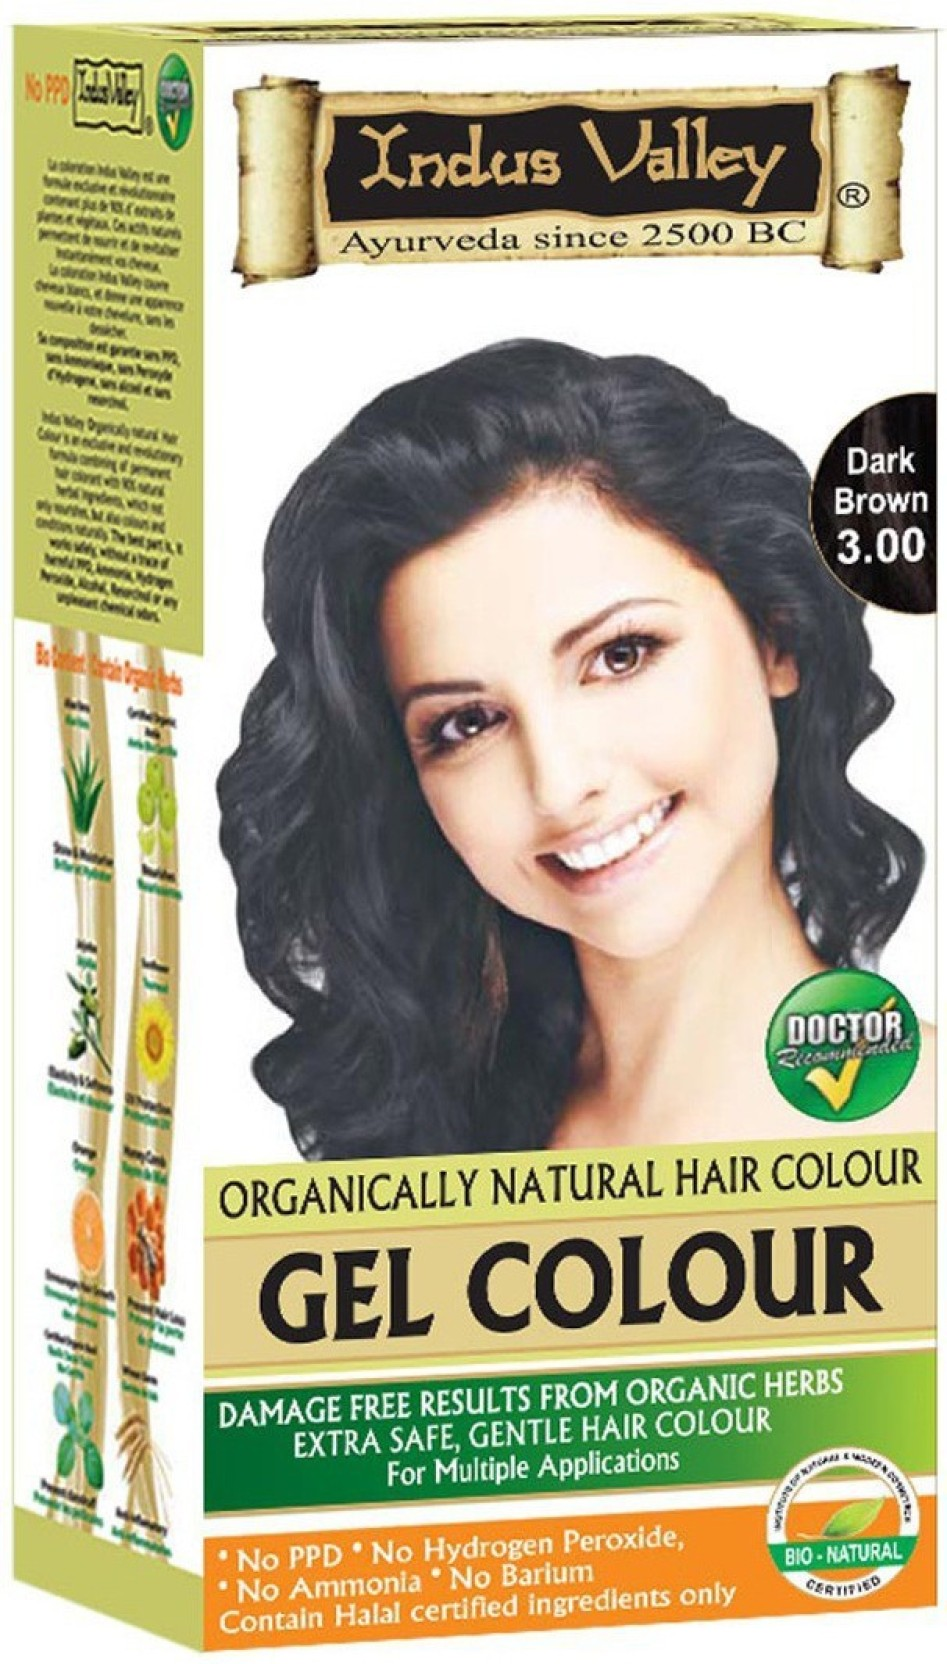 Indus Valley Organically Natural Gel Dark Brown 300 Permanent Hair